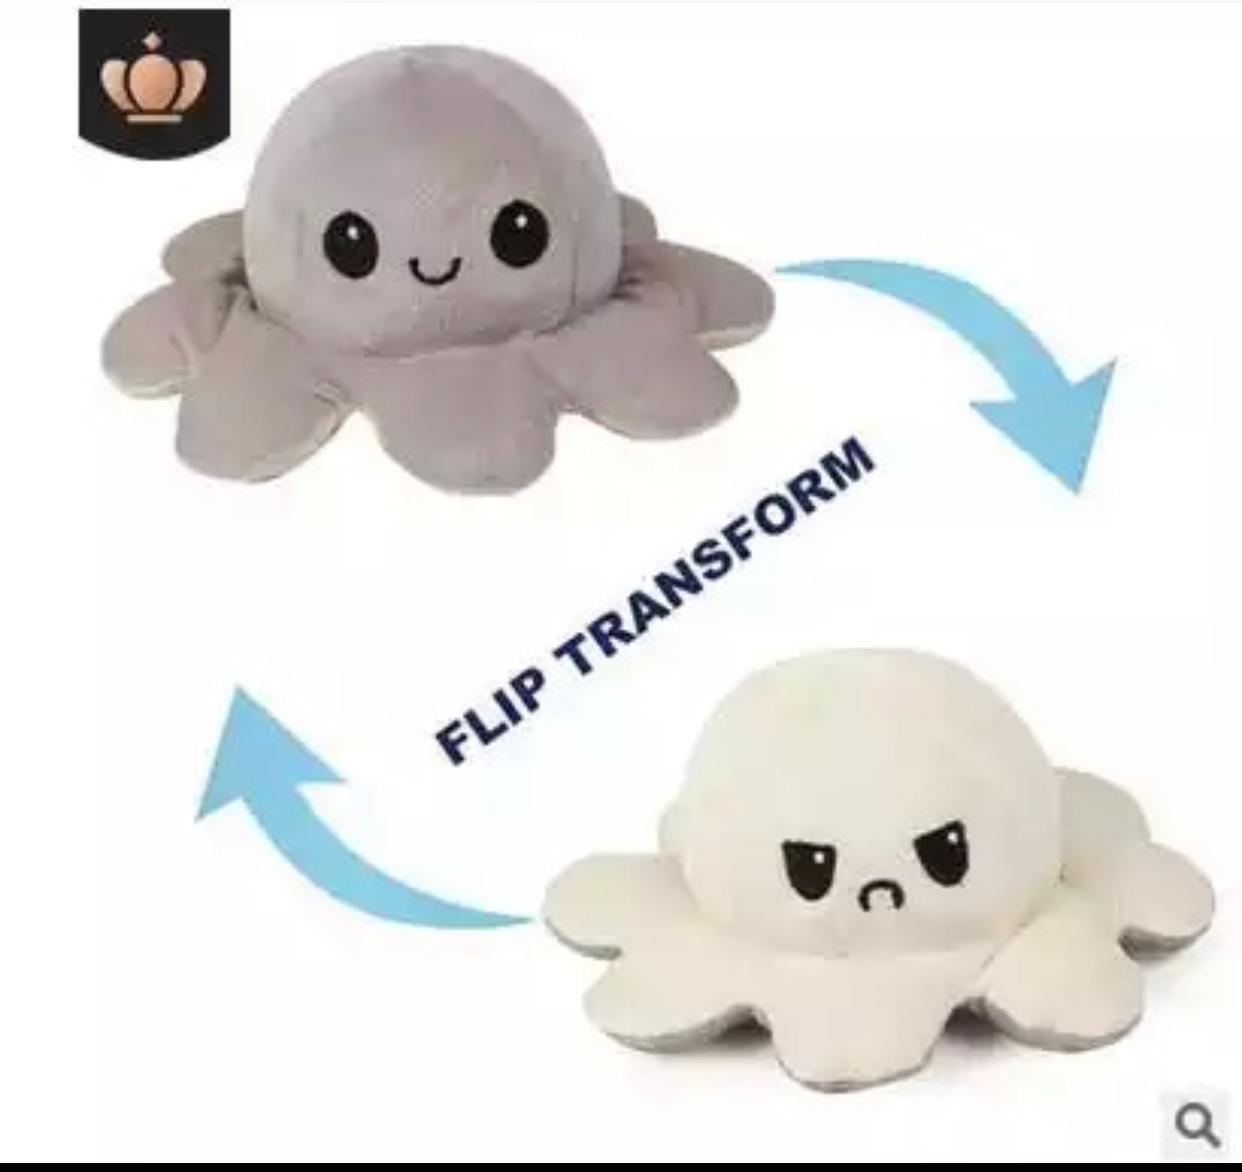 Pelucia Do Humor Polvo Flip Reversivel Cinza e Branco: Kawaii Brinquedo Tik Tok 20cm - EV